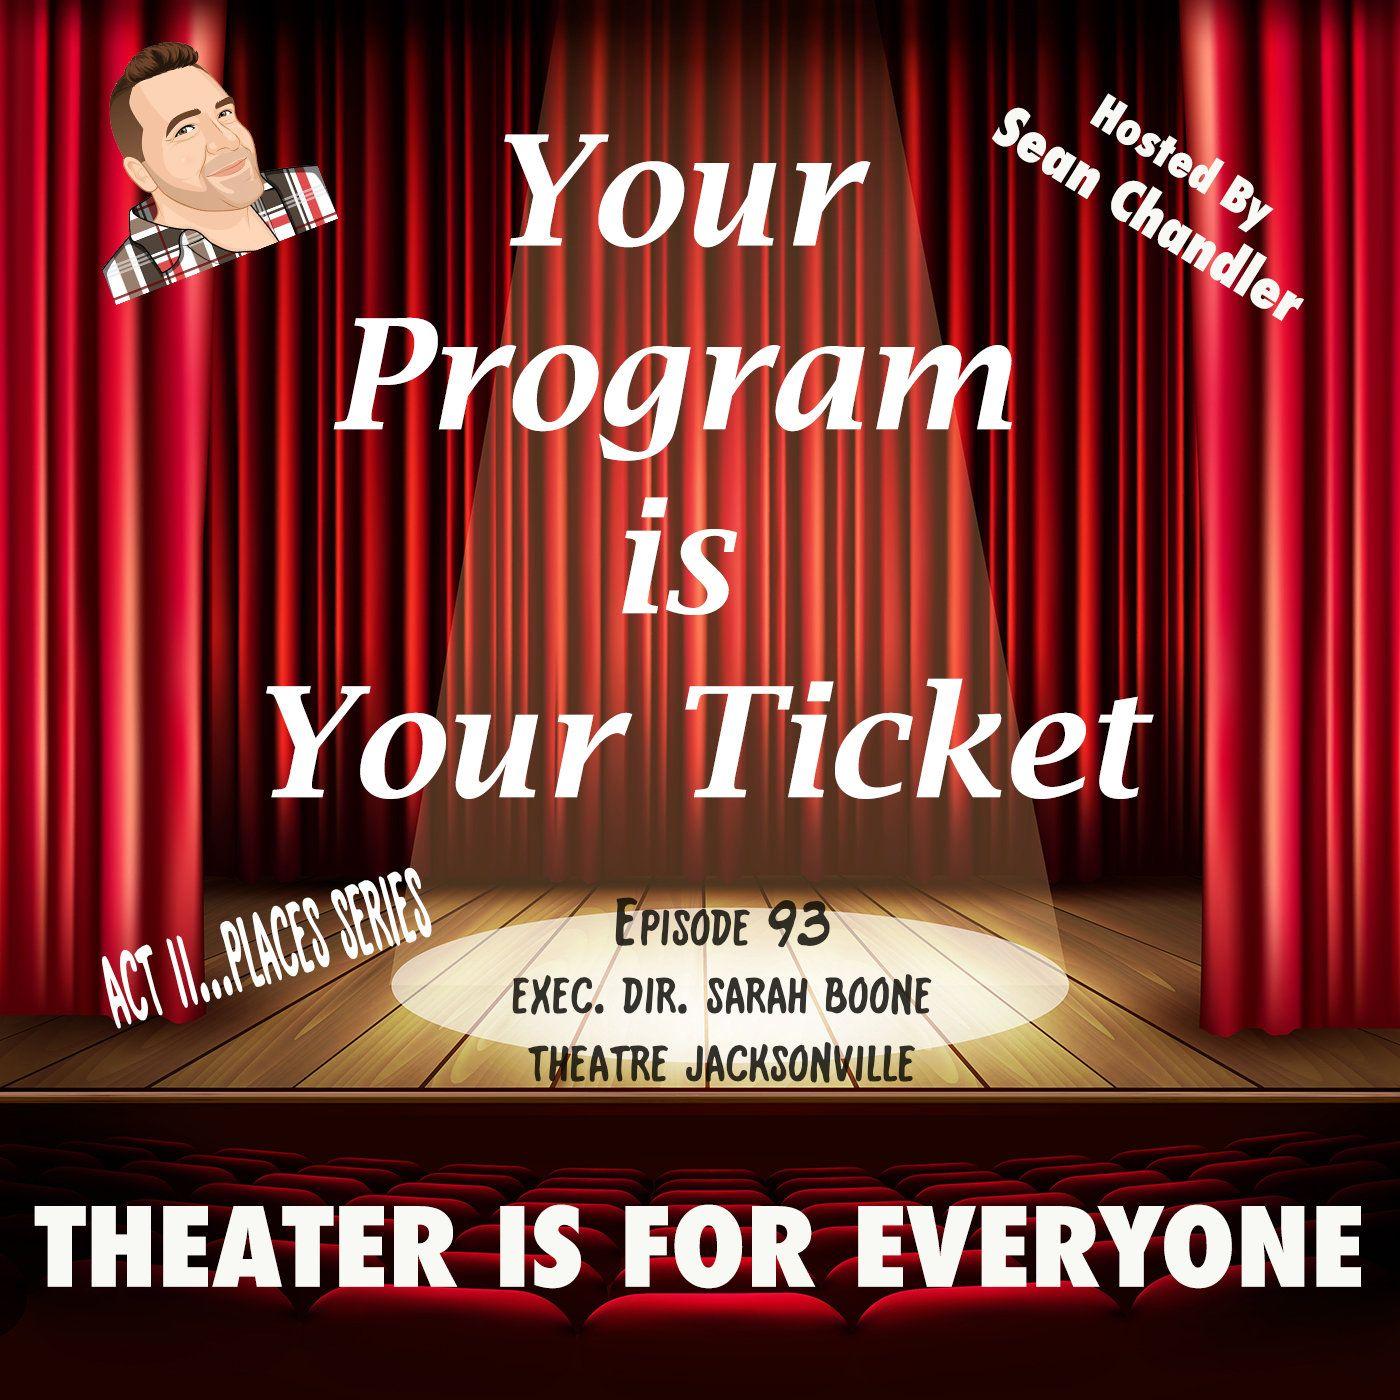 Ep093-Act II Places-Theatre Jacksonville Exec. Dir. Sarah Boone